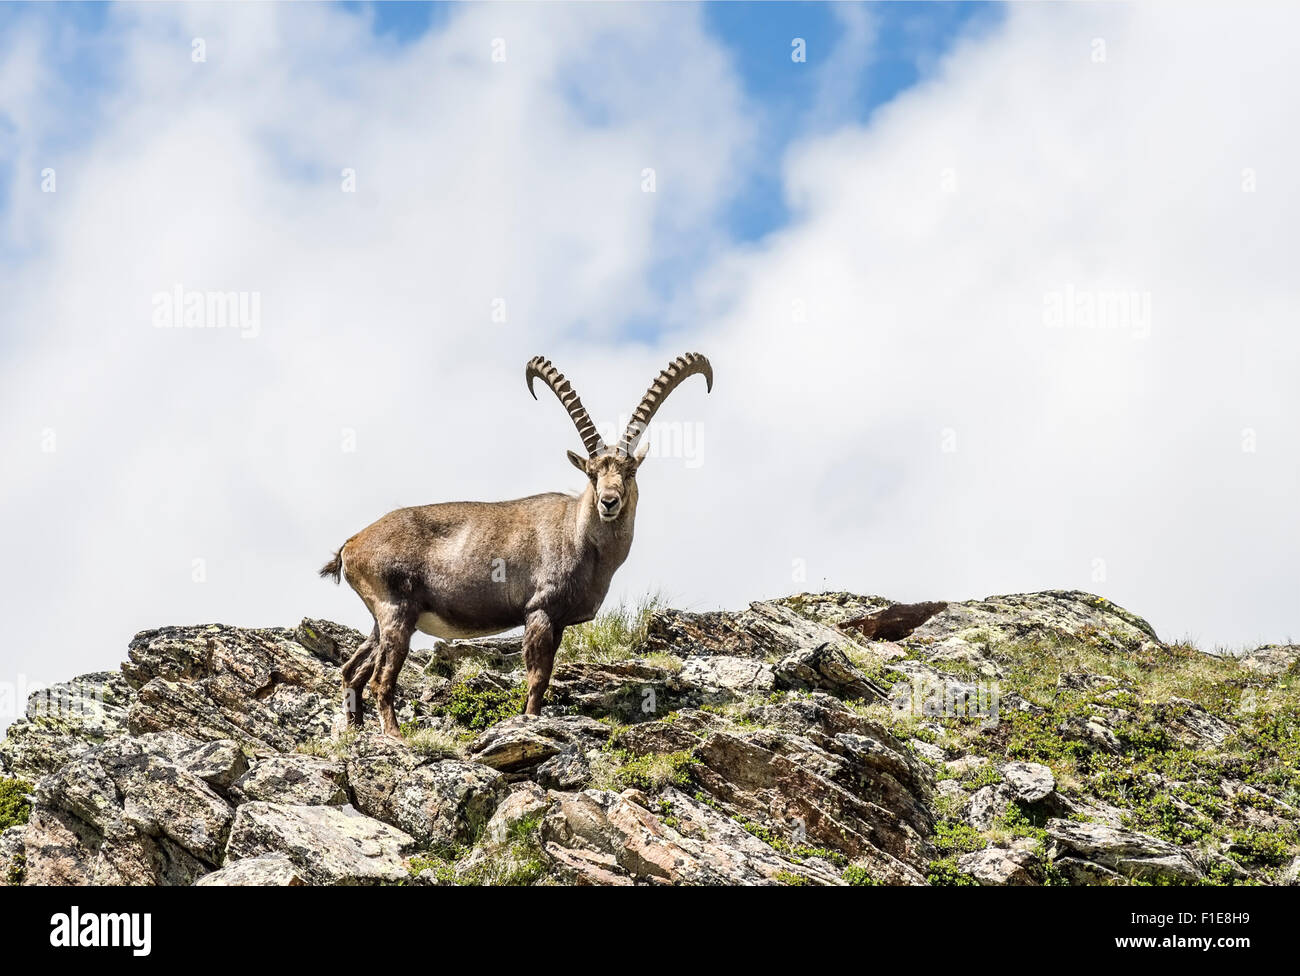 Single Alpine Ibex, Swiss Alps, Switzerland   Einzelner Alpen-Steinbock, Pontresina, Graubuenden, Schweiz - Stock Image